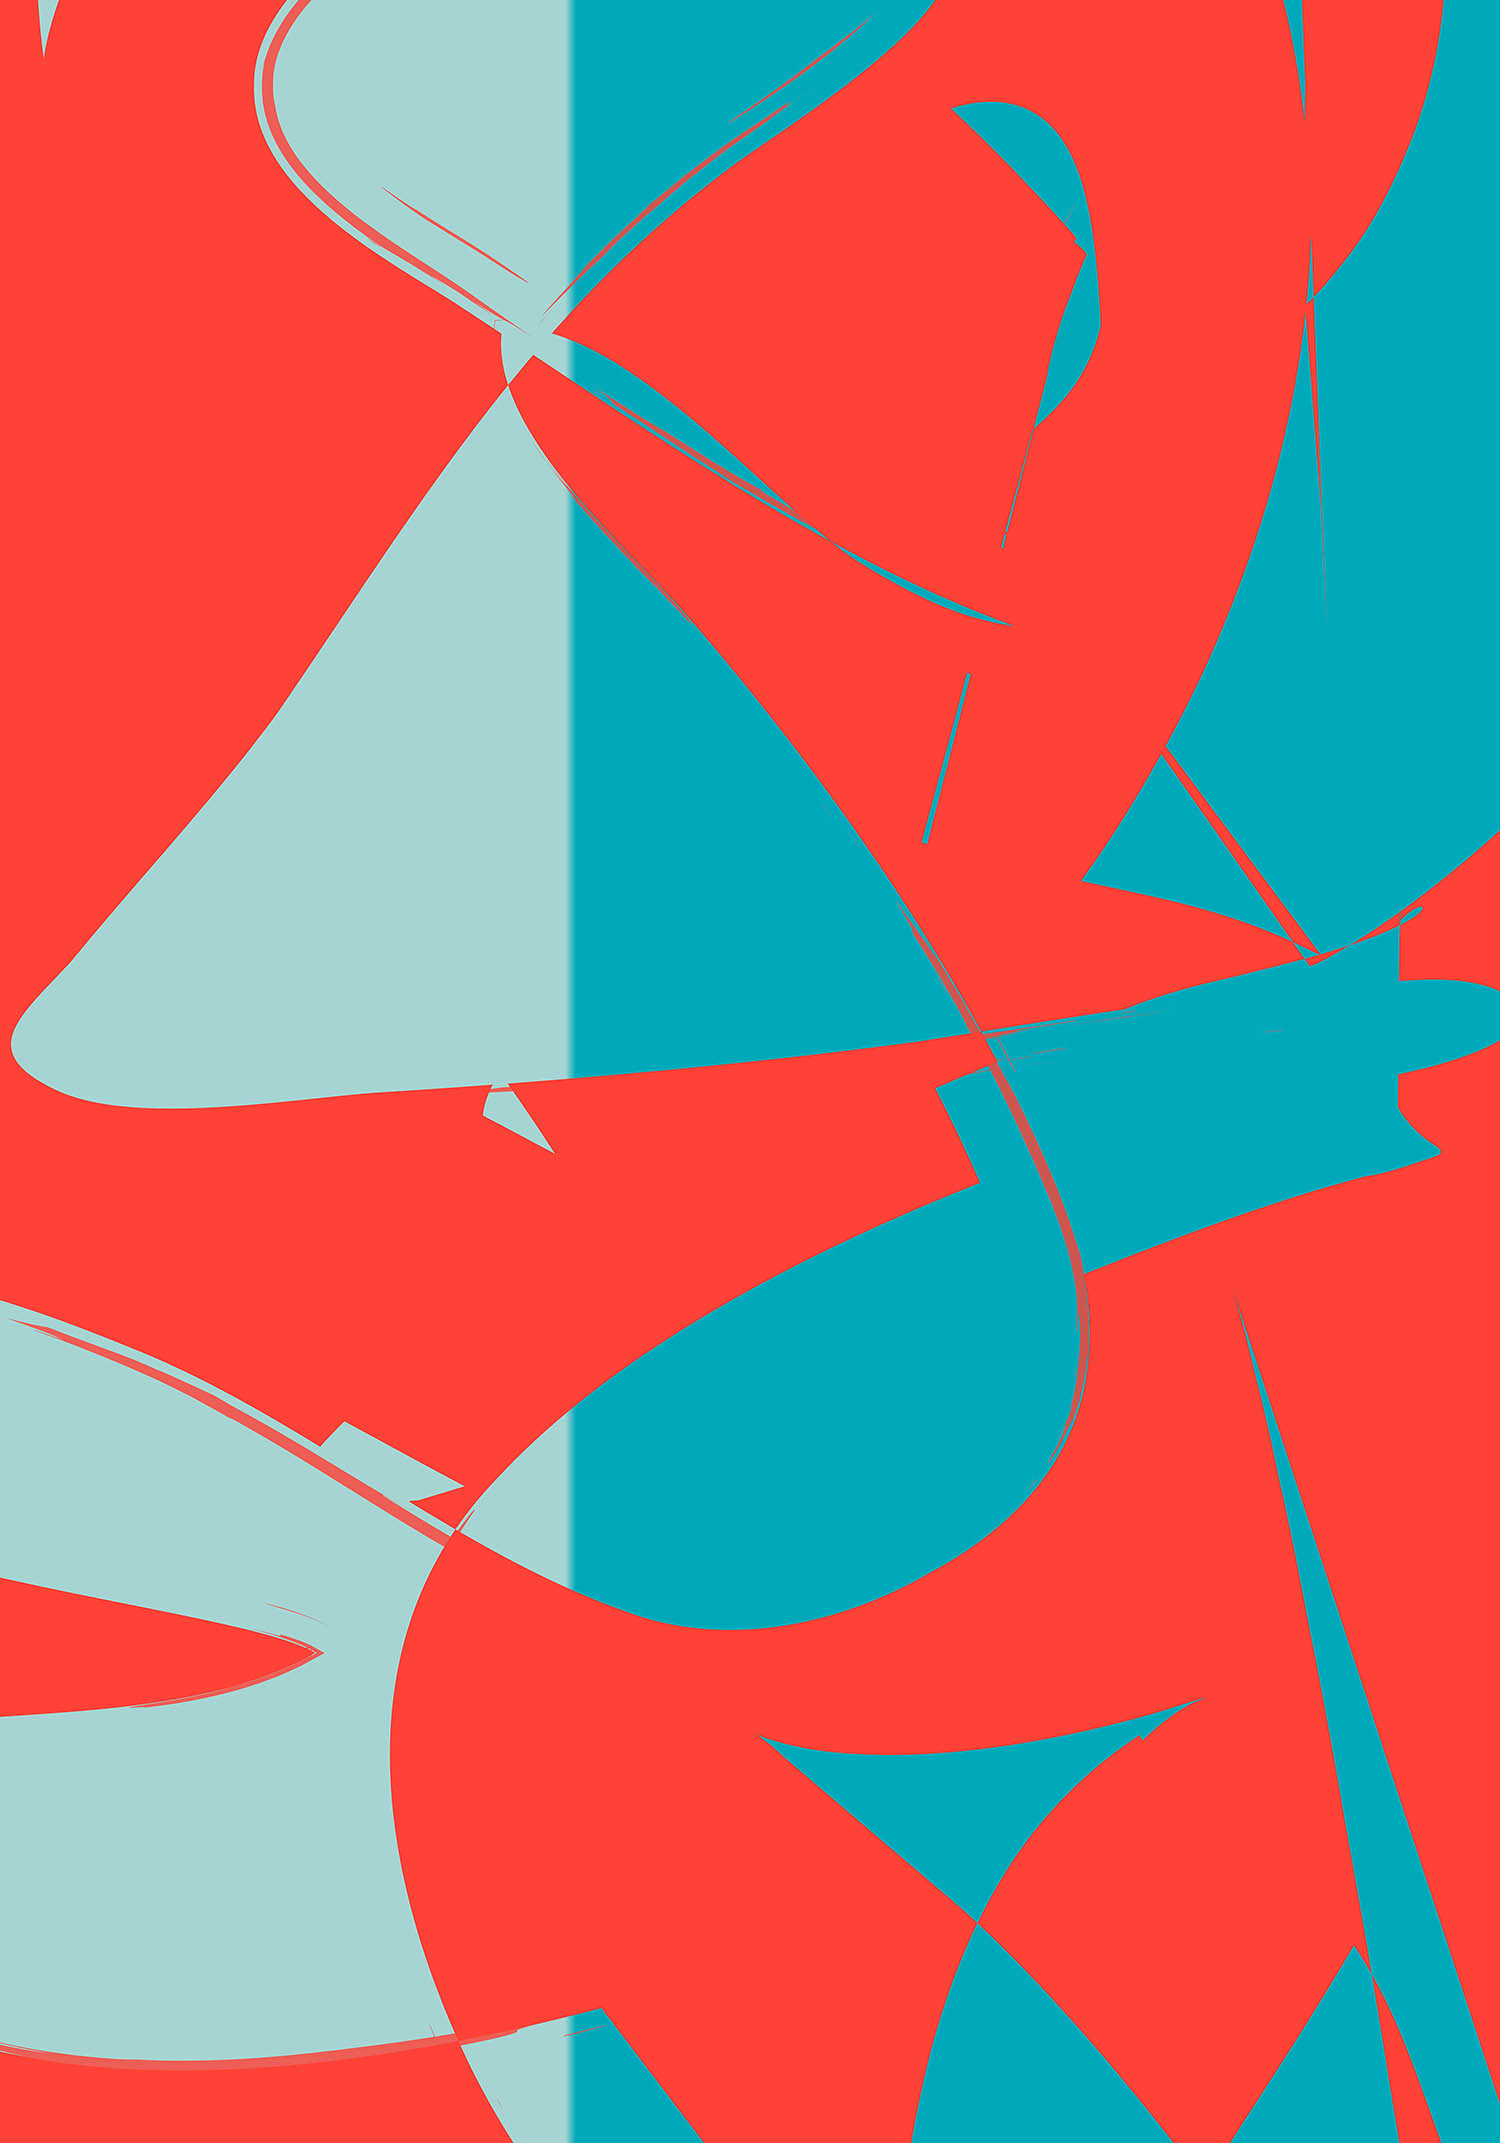 oB 43 by greek multidisciplinary artist Kostas Gogas